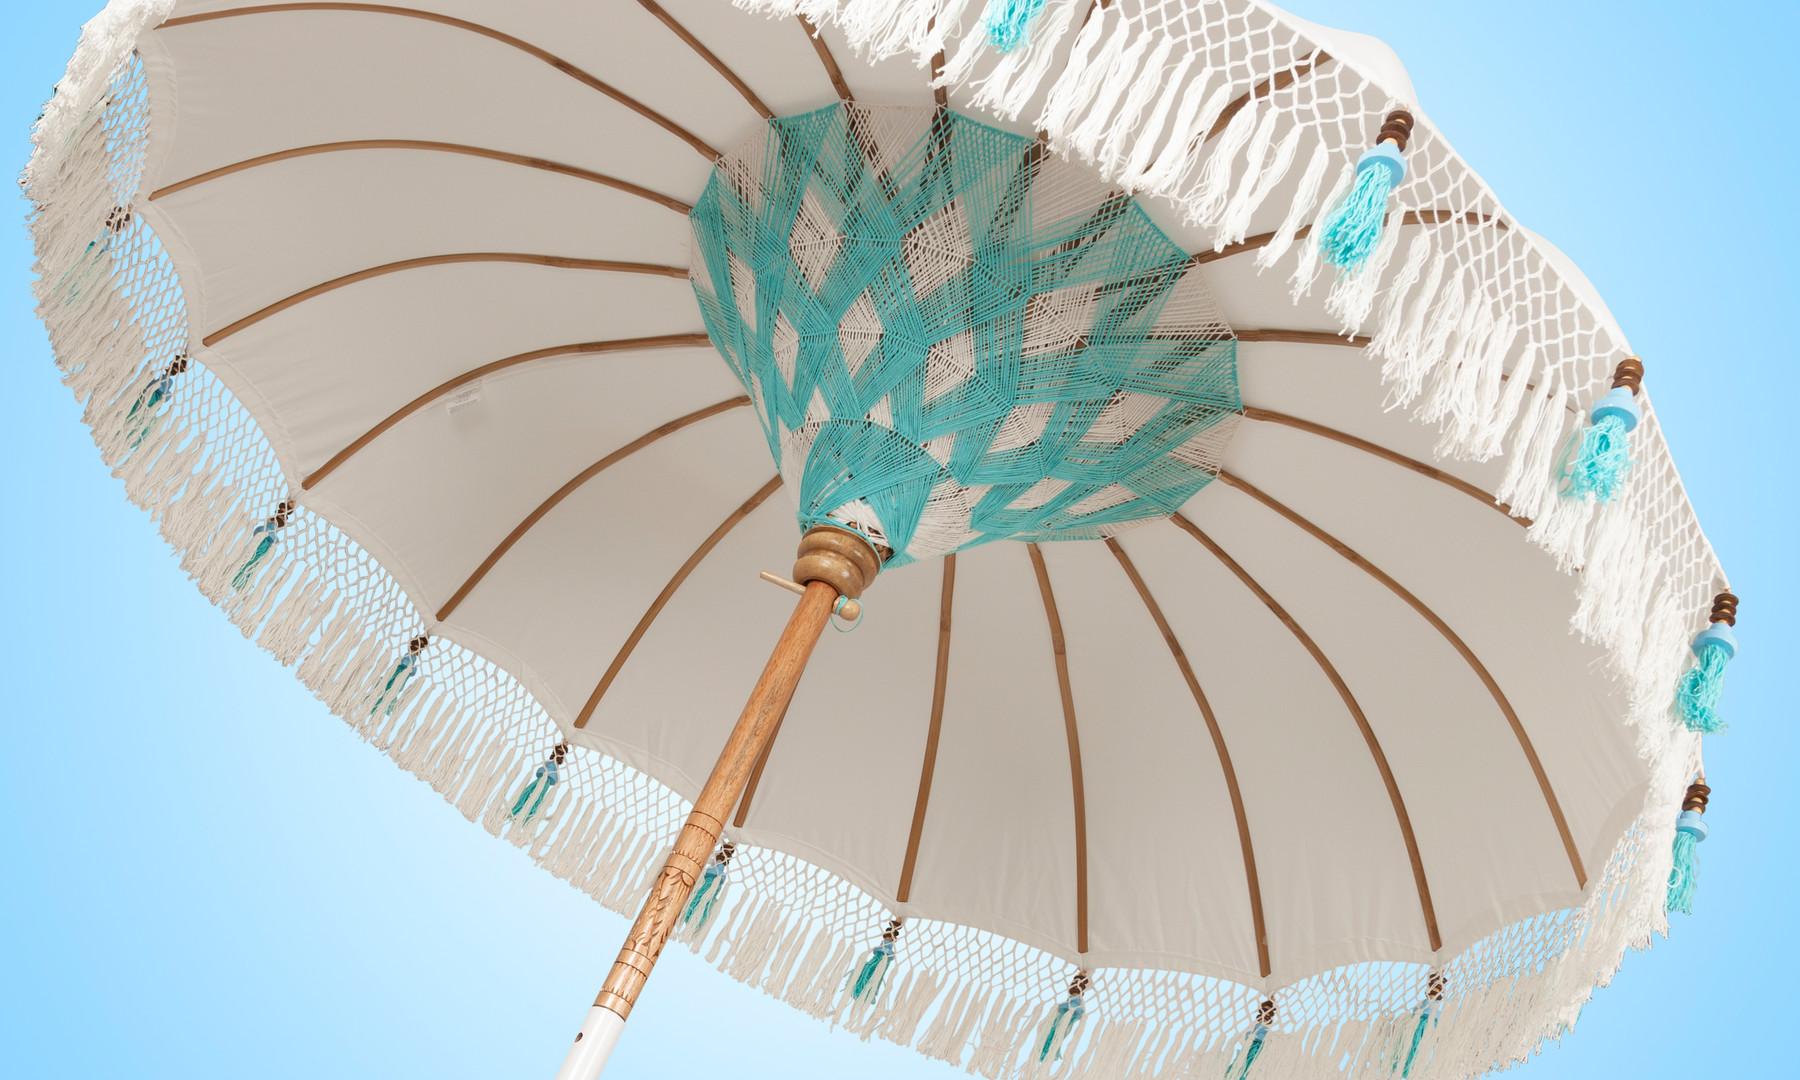 Bali Parasol Beach Chic Turquoise